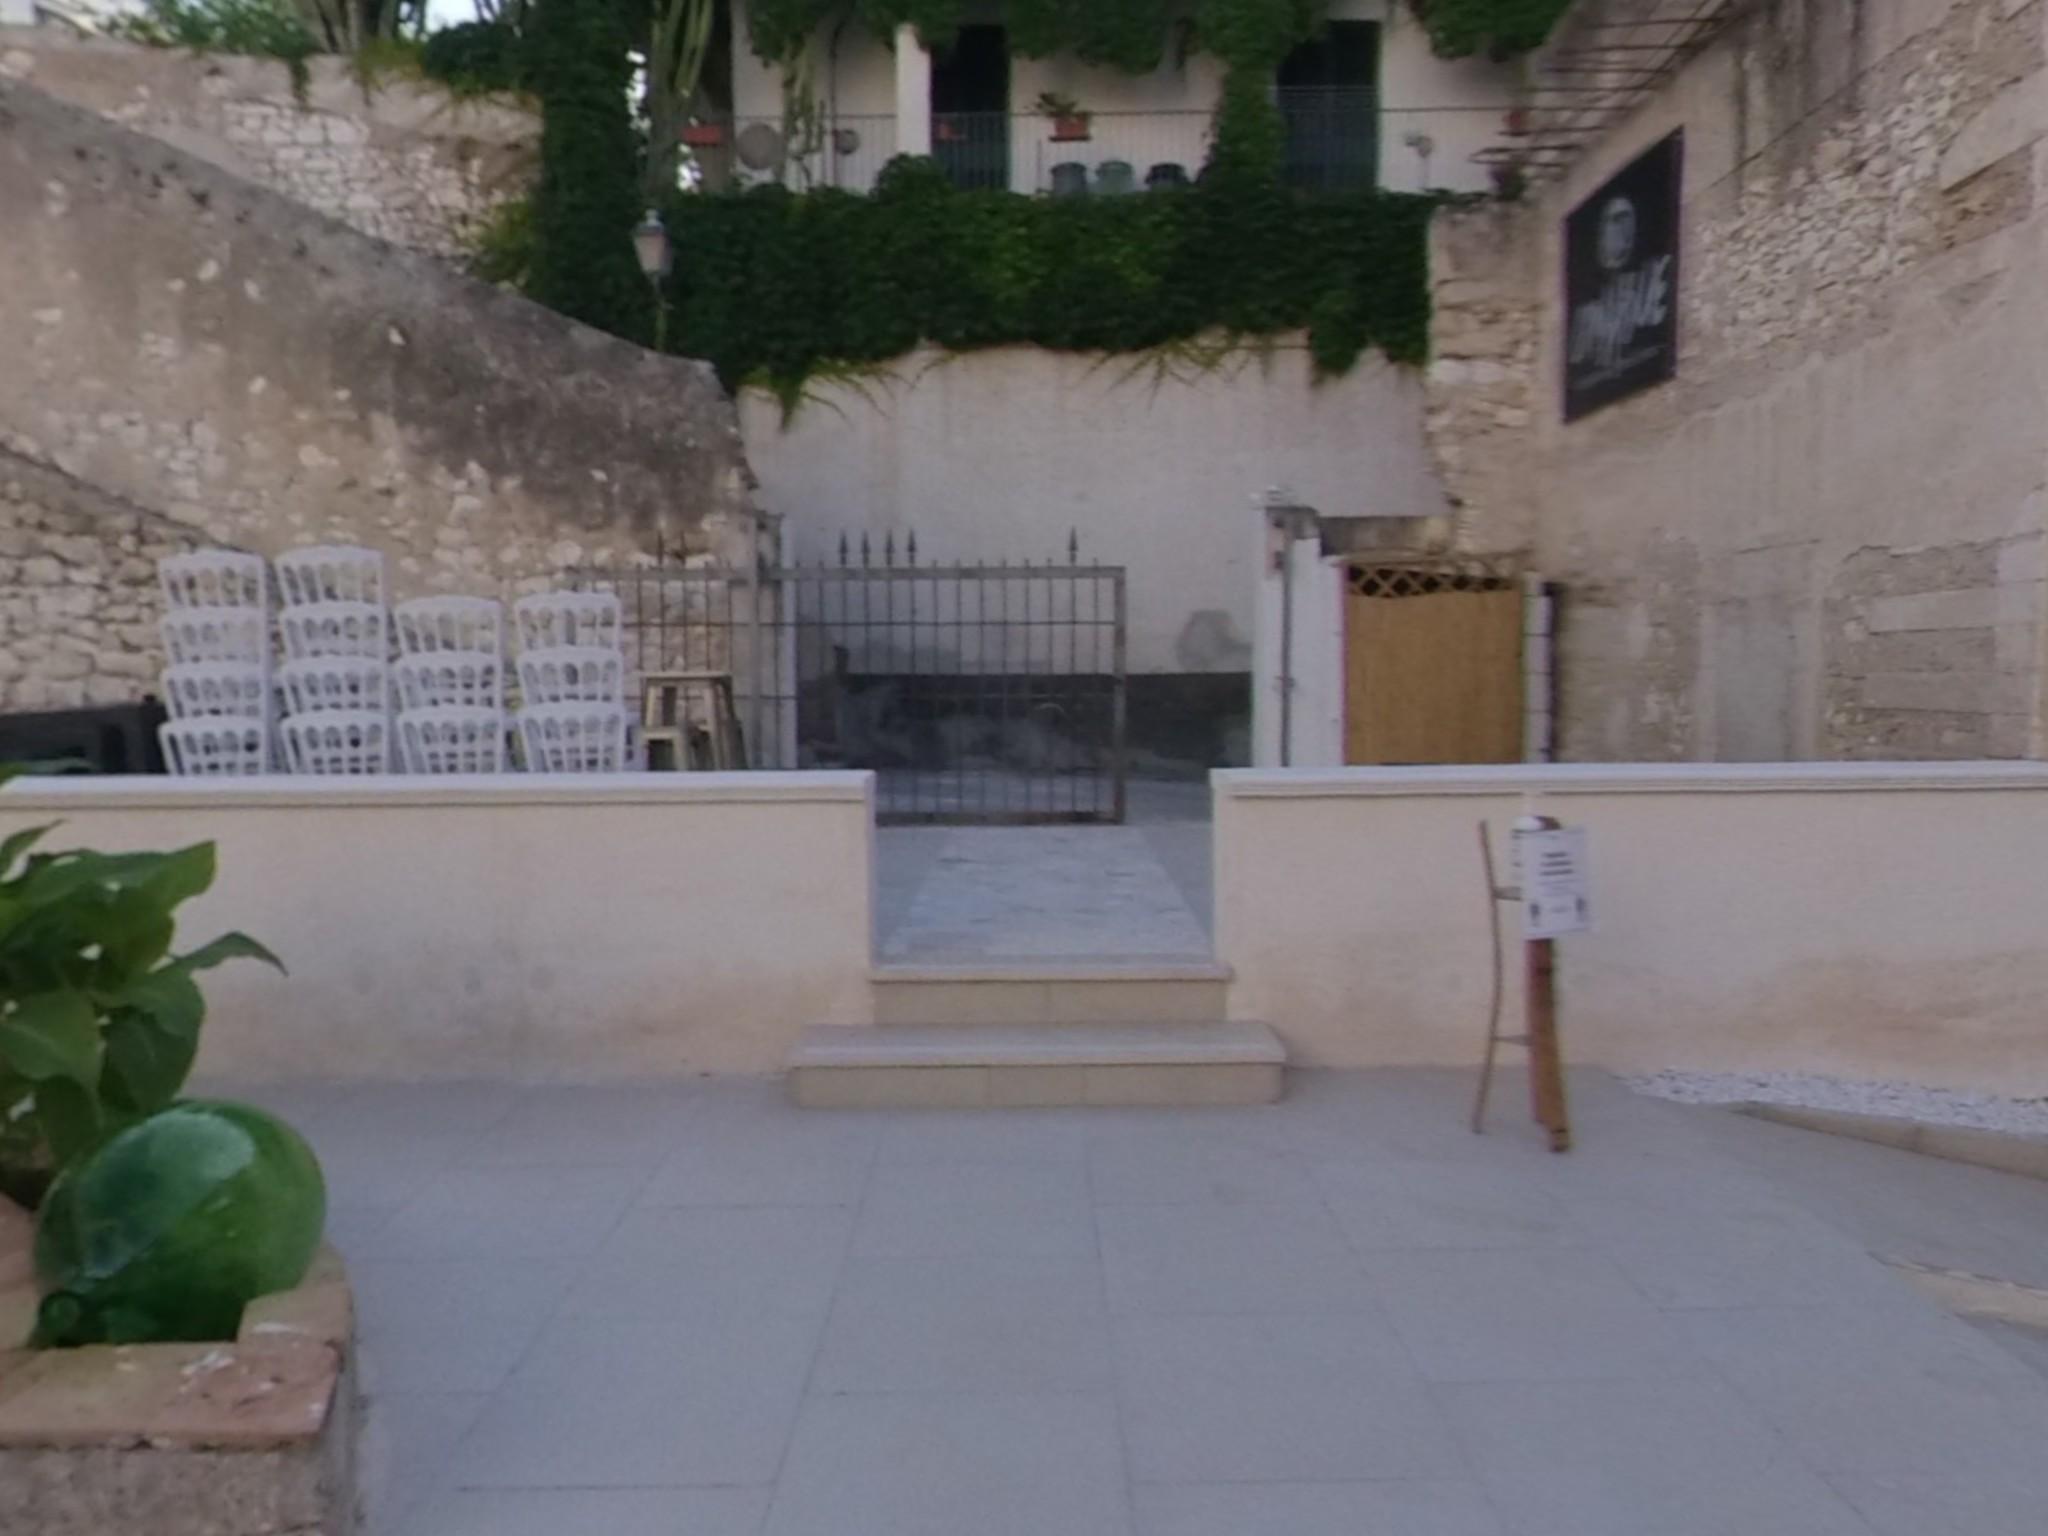 ingresso_giardino_4_86b6c4